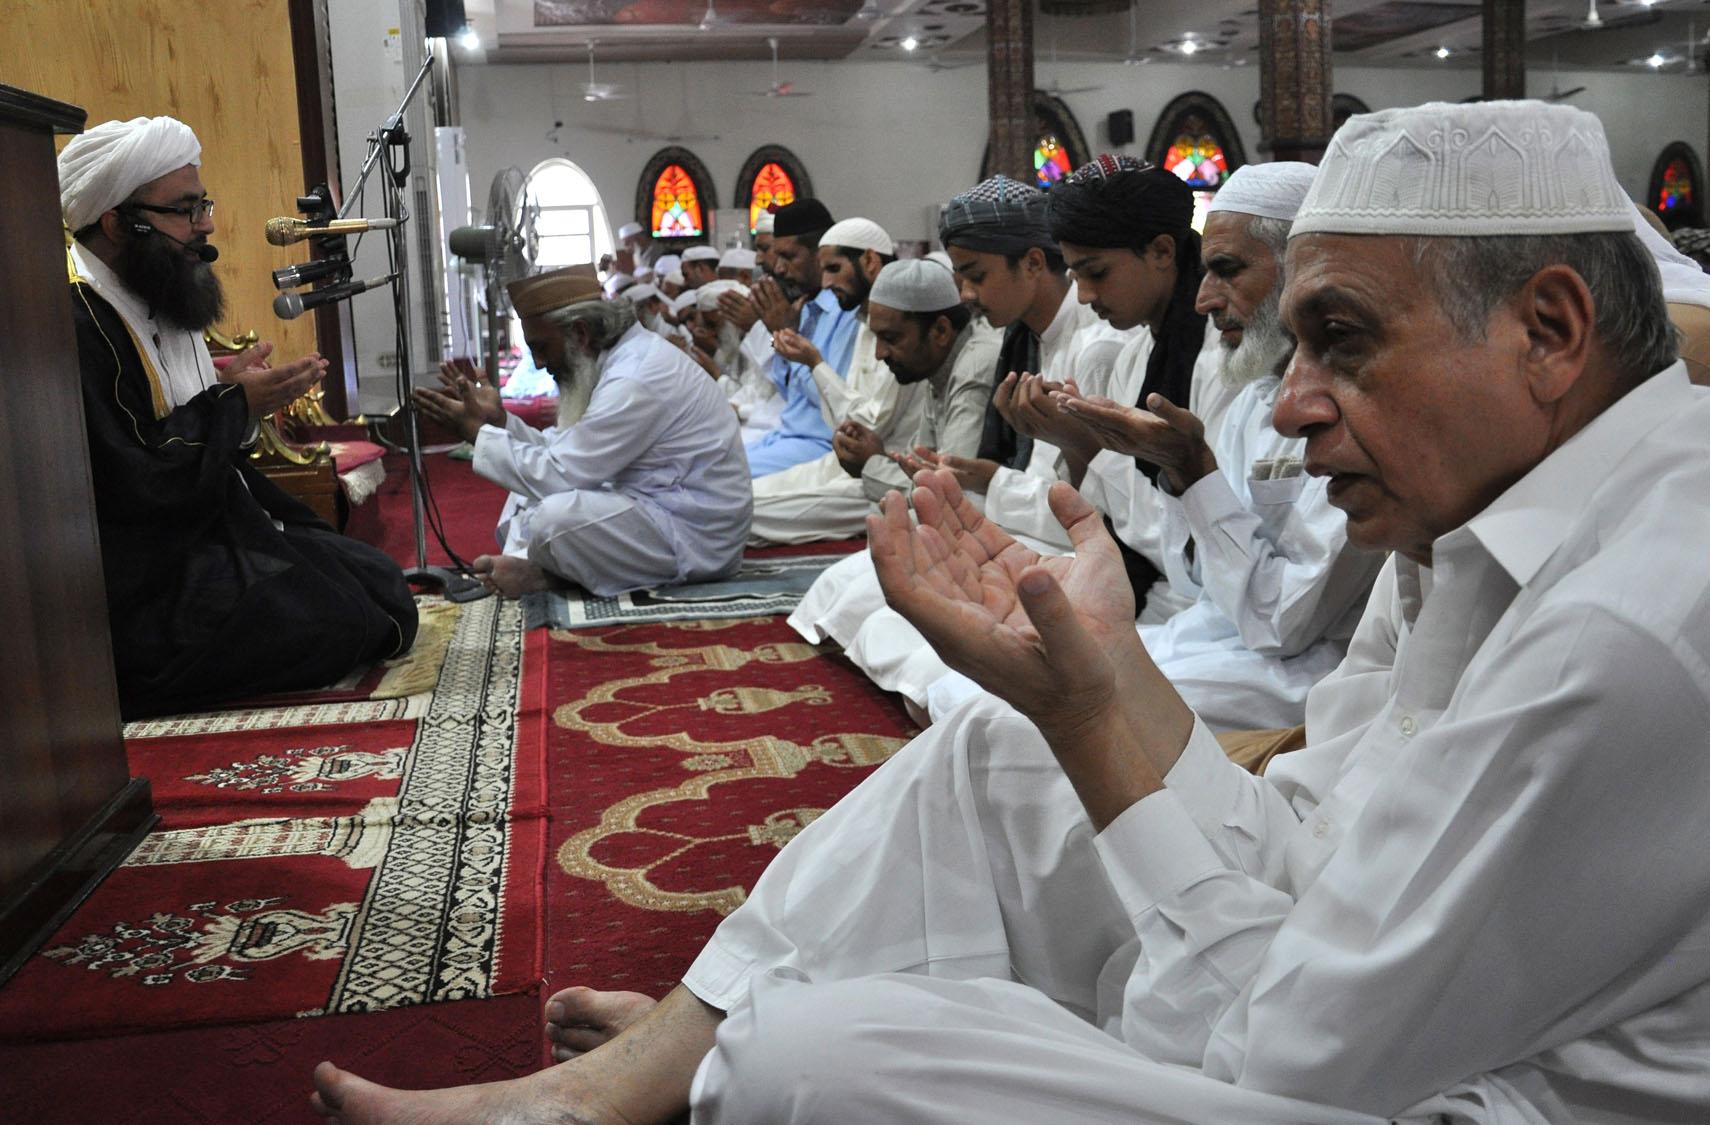 Muslims celebrate Eid al-Adha around the world